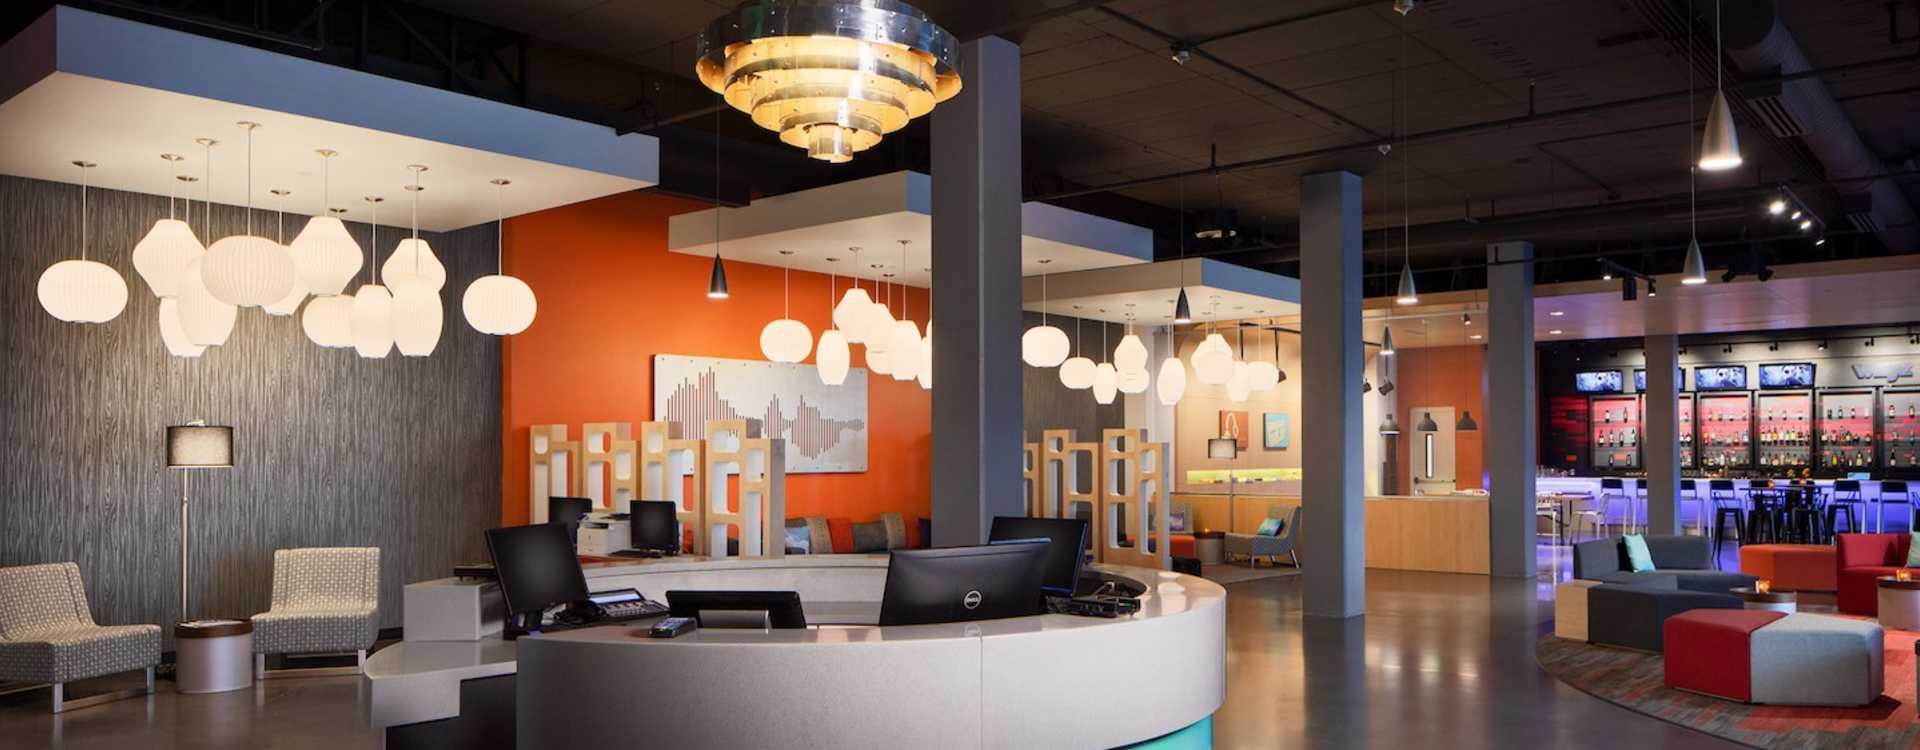 Aloft Lobby